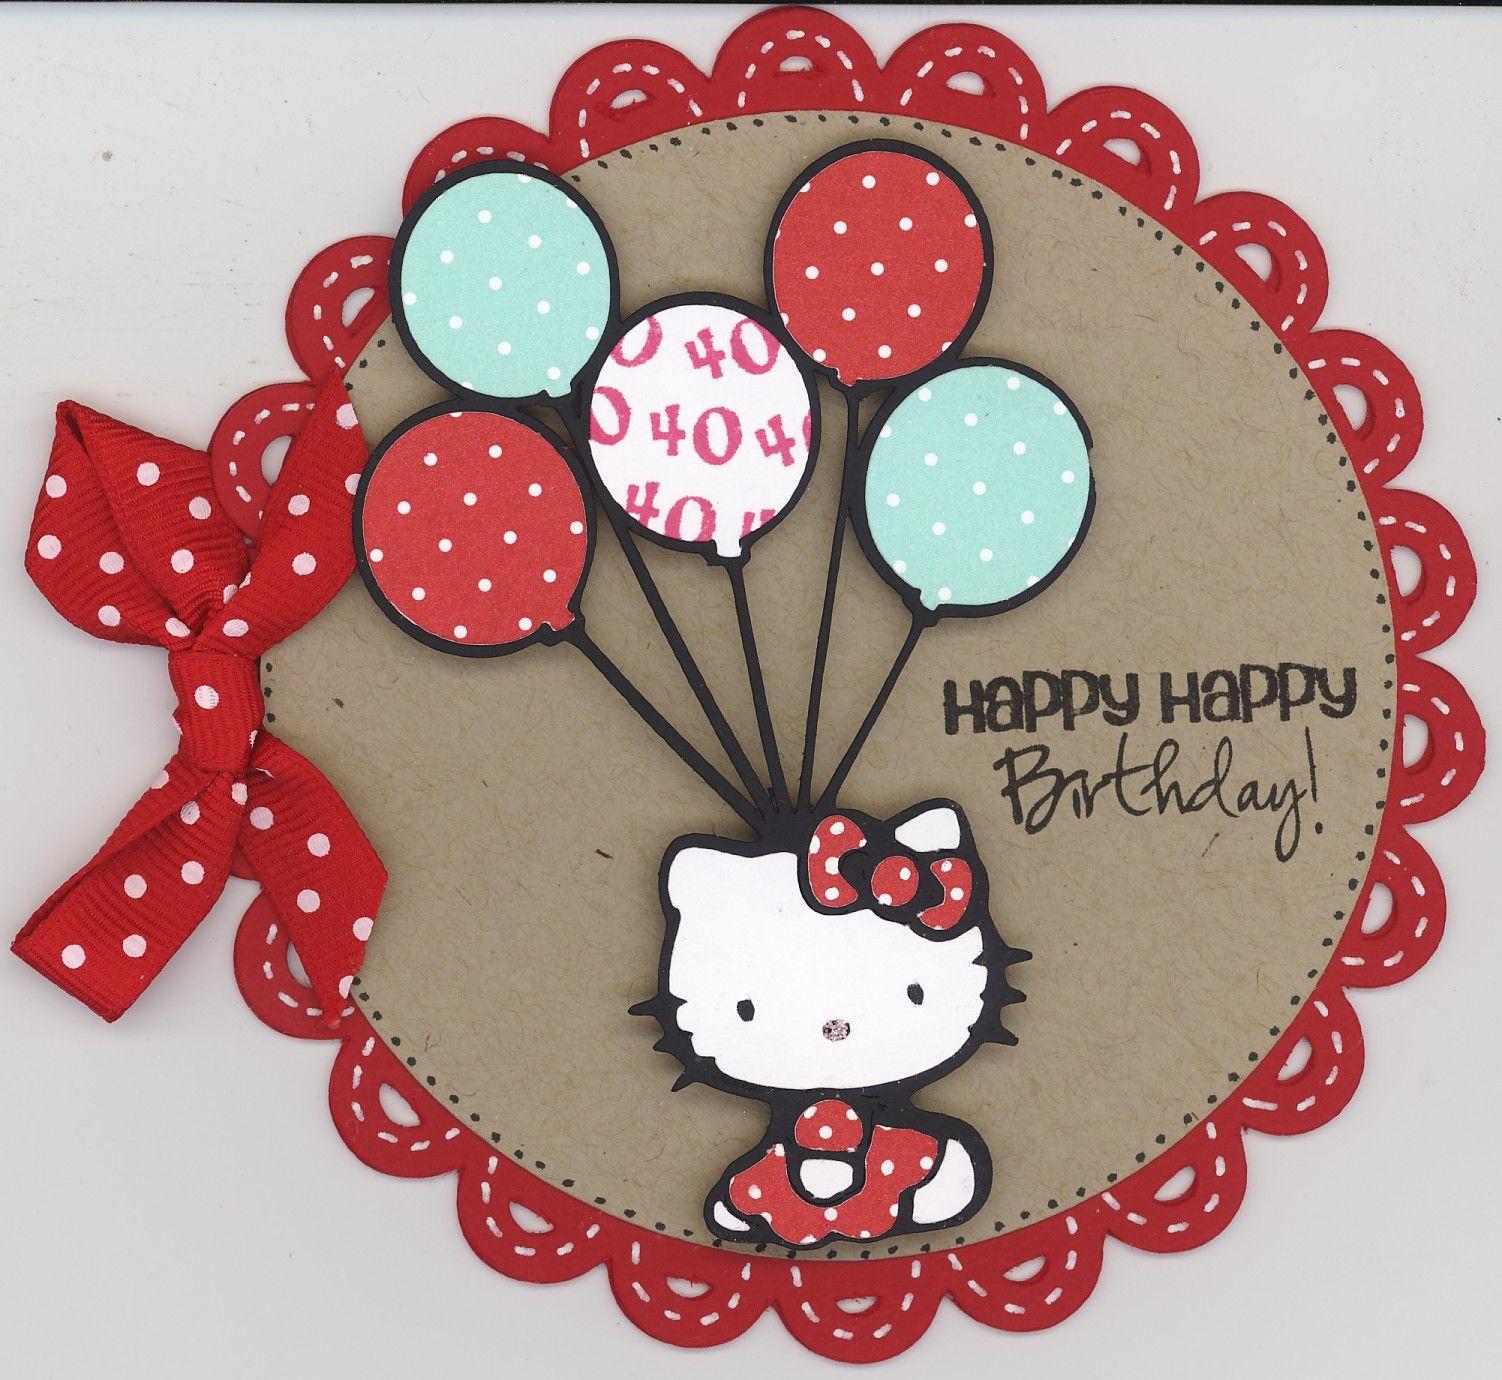 Best Wallpaper Hello Kitty Zebra - ce3703de96fb47f27660bb4283e1e034  Pictures_453923.jpg